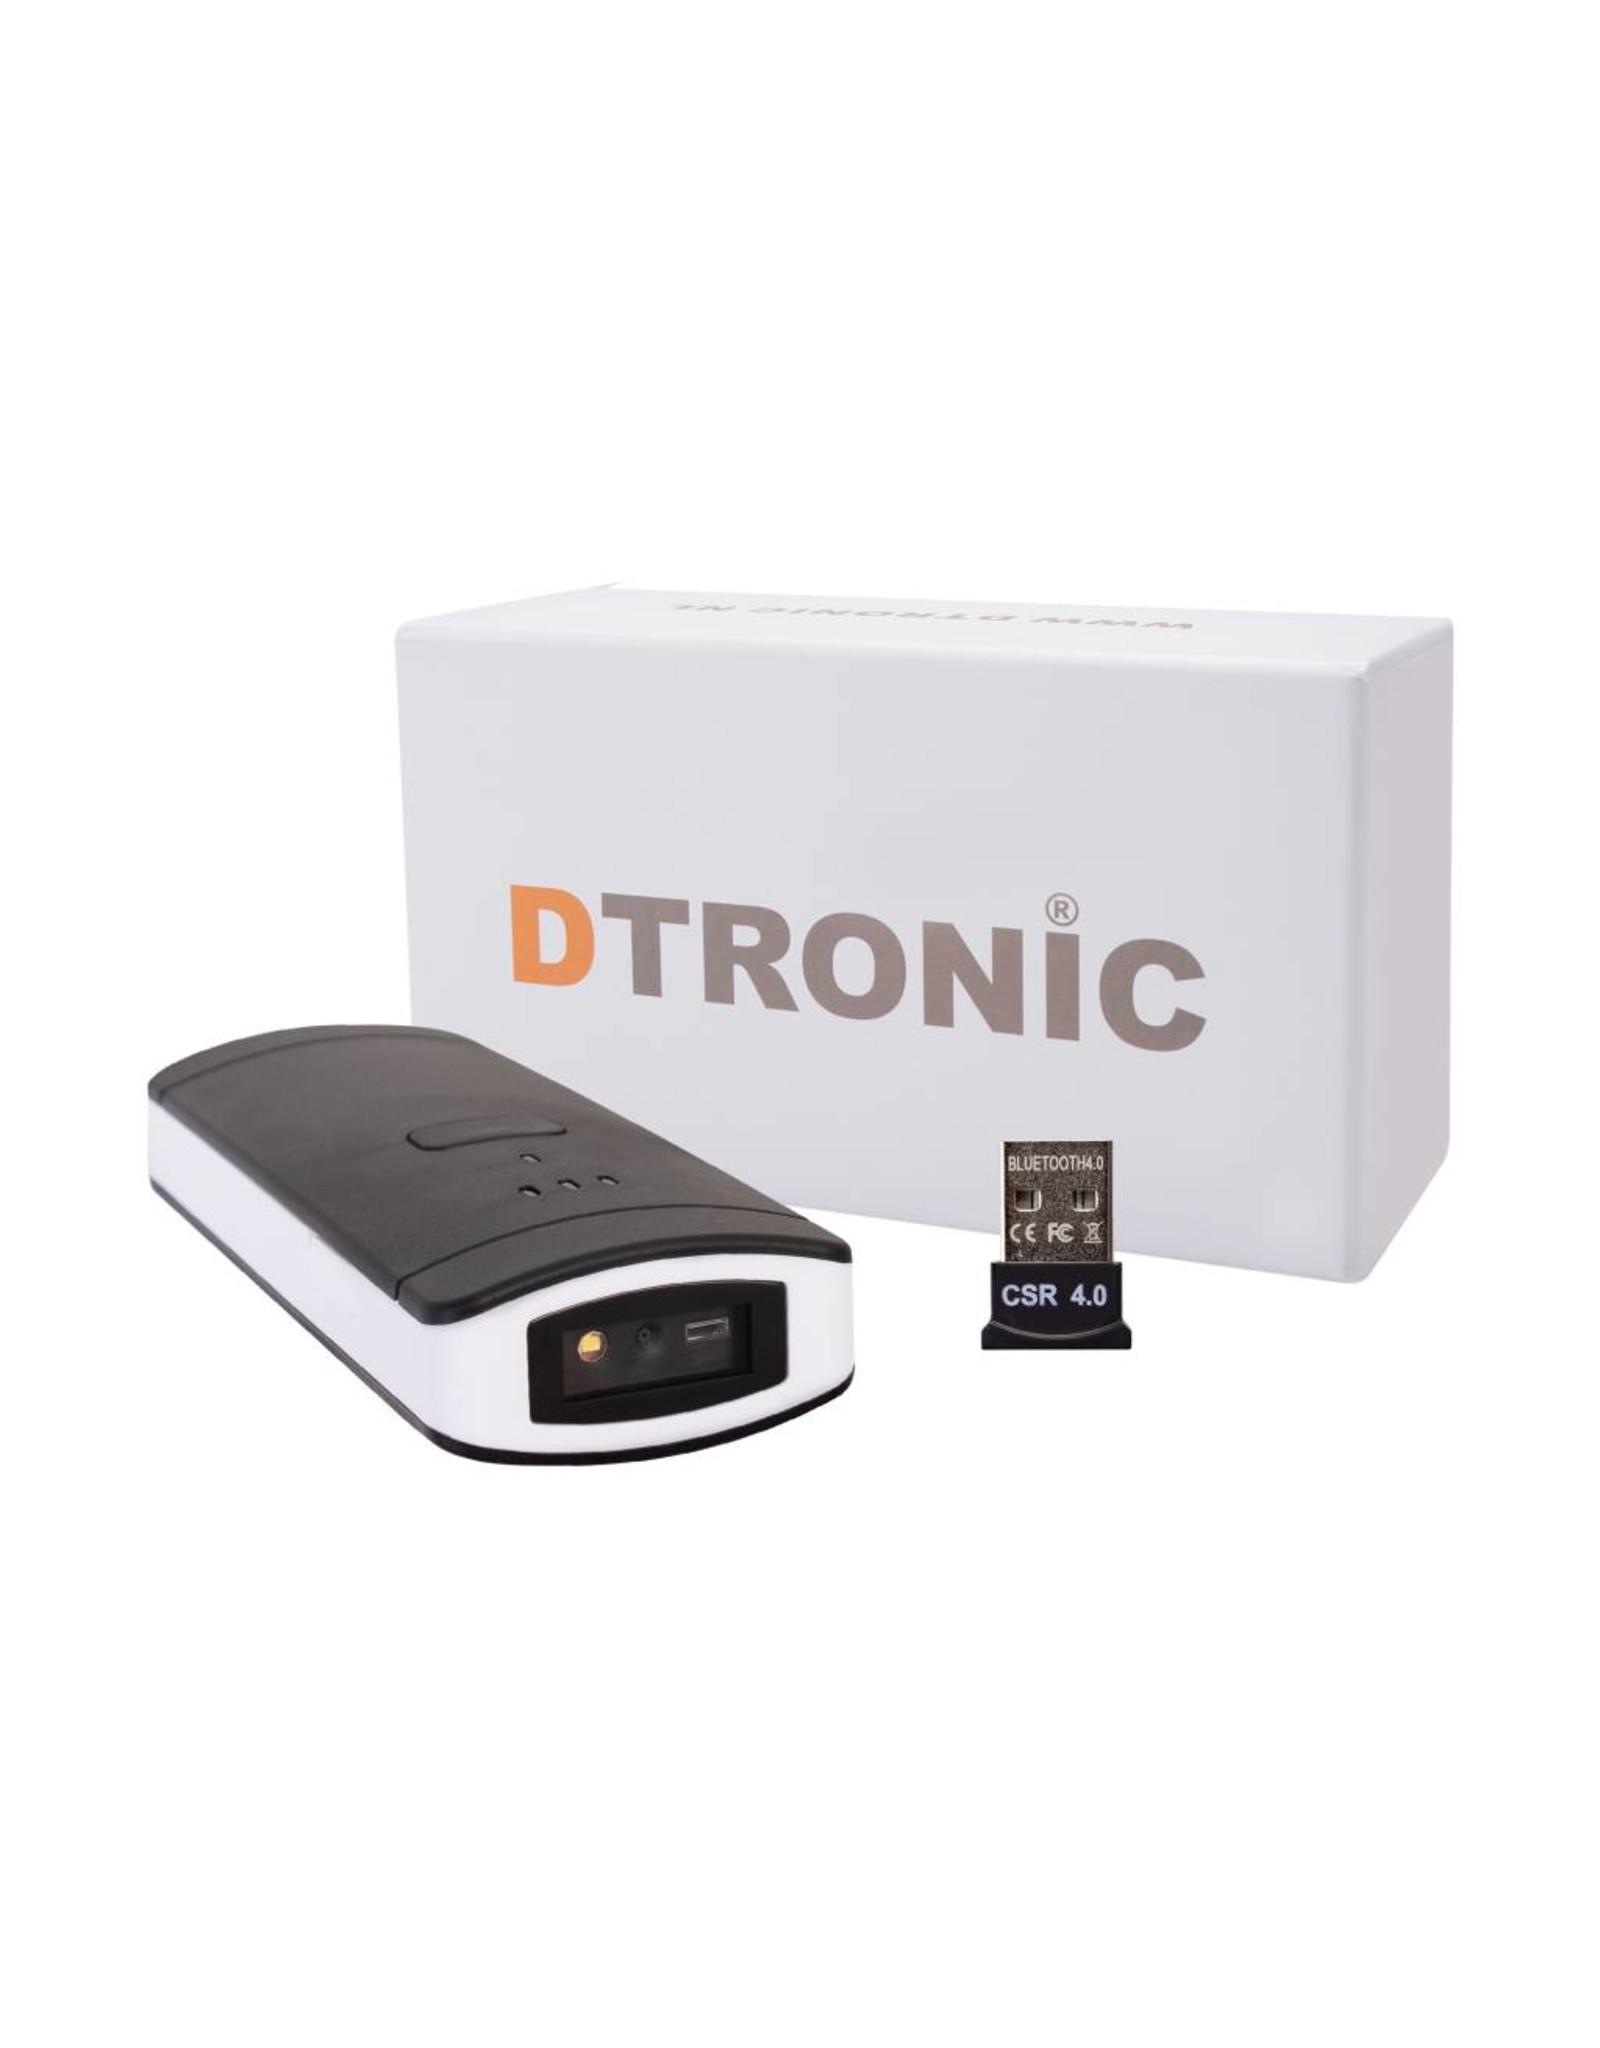 DTRONIC DTRONIC - P2000